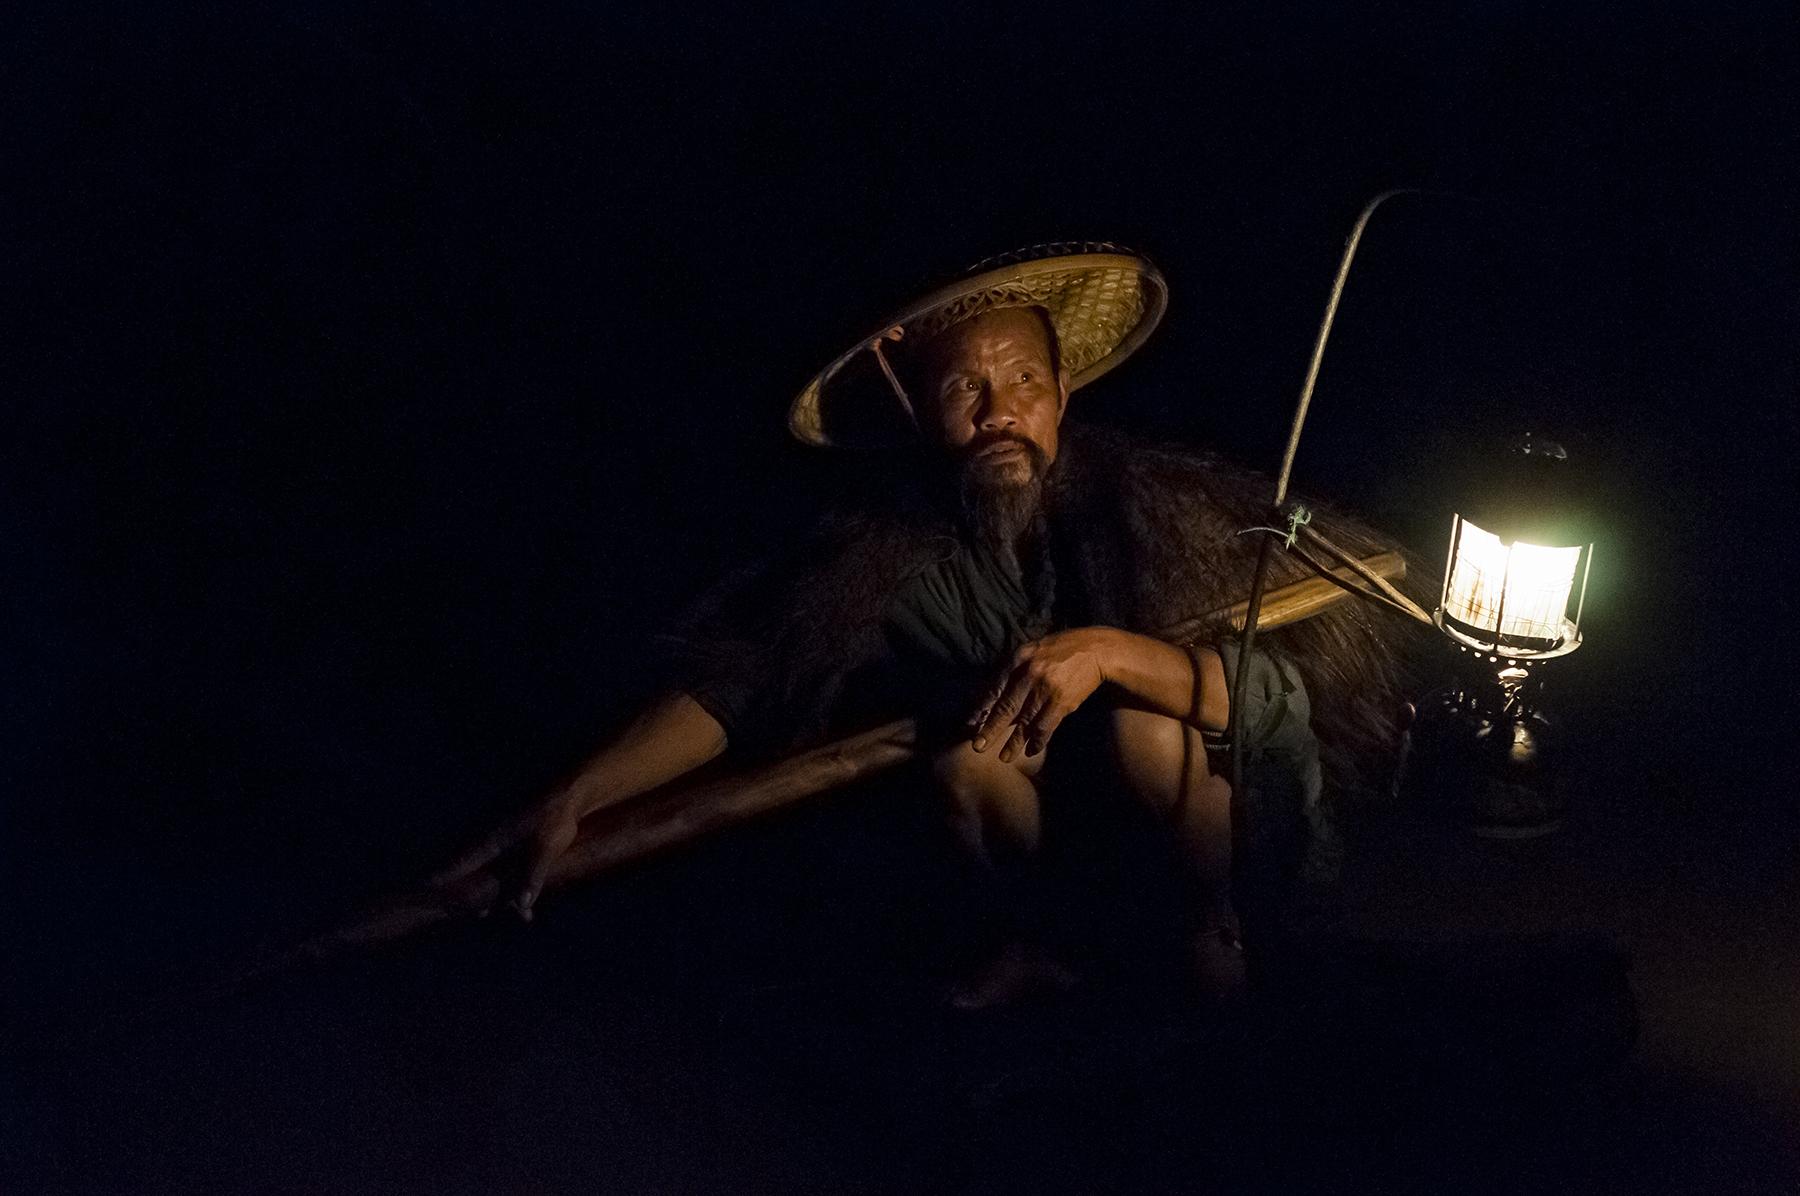 Marlene_Miyamoto_Dying Arts_Cormorant Fisherman 6_ 6.jpg